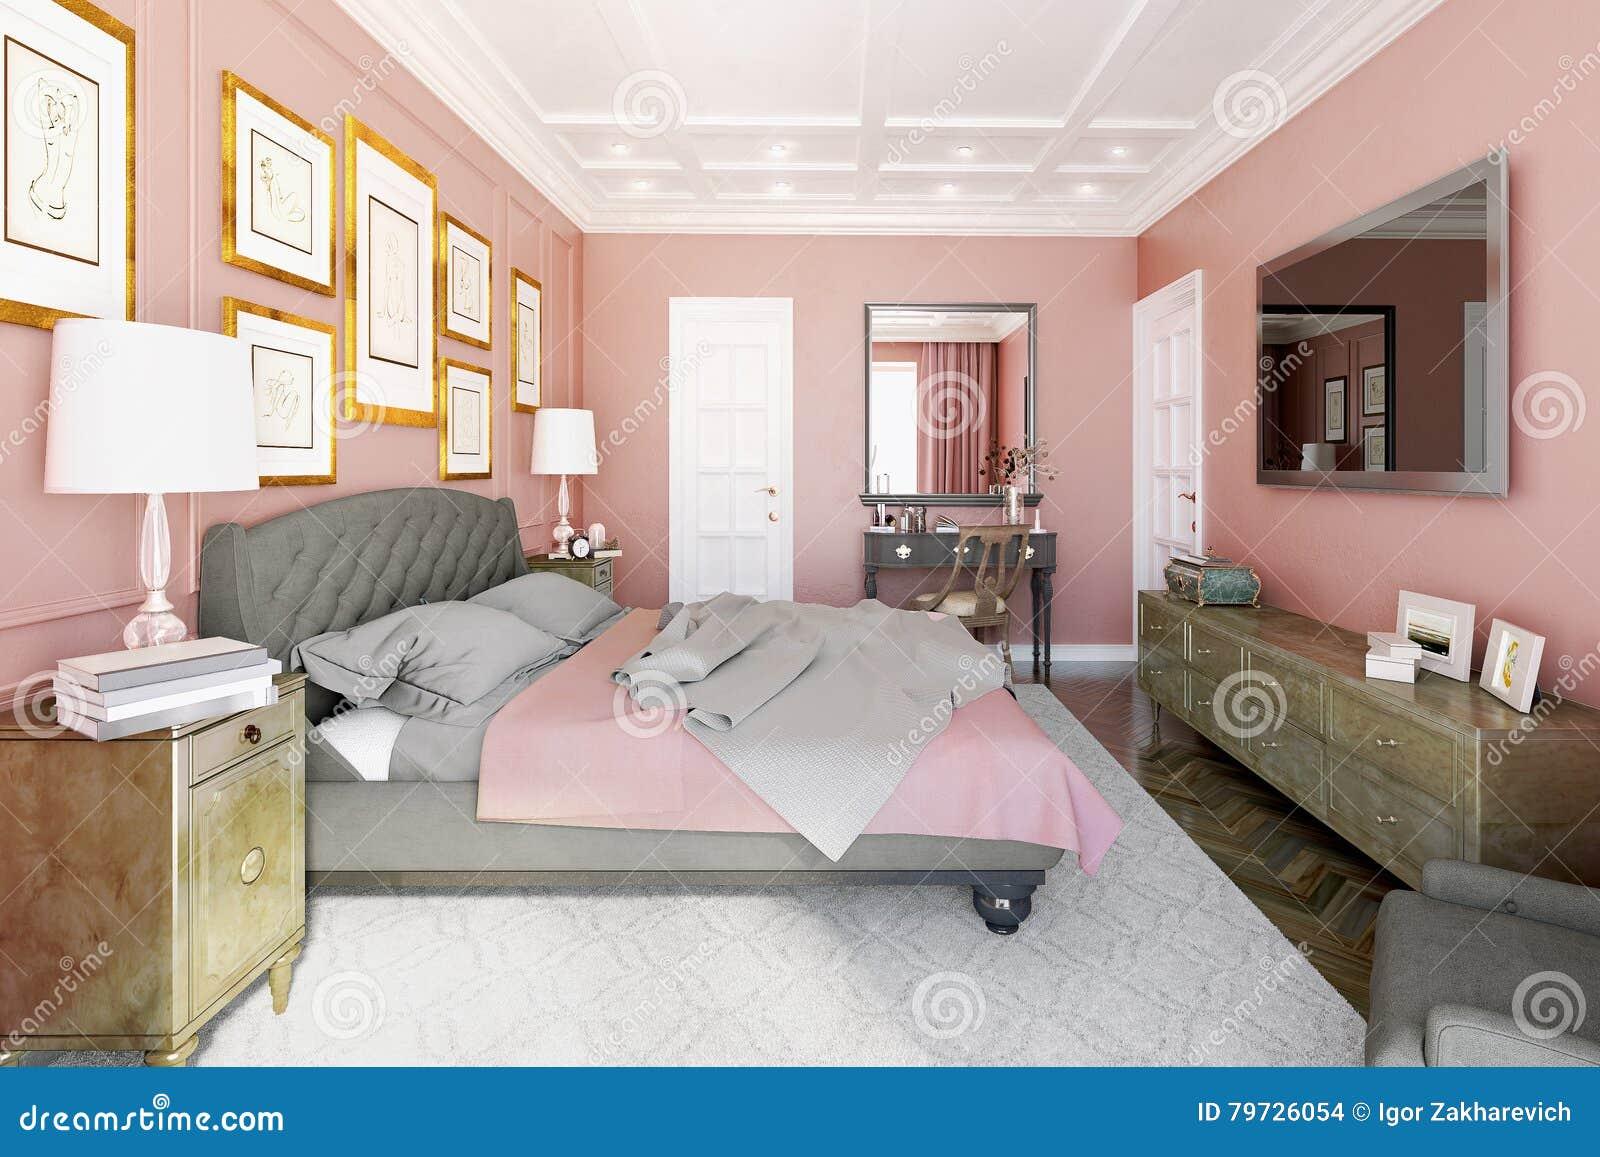 Dormitorio Principal Con Diseno Moderno Stock De Ilustracion - Dormitorio-diseo-moderno